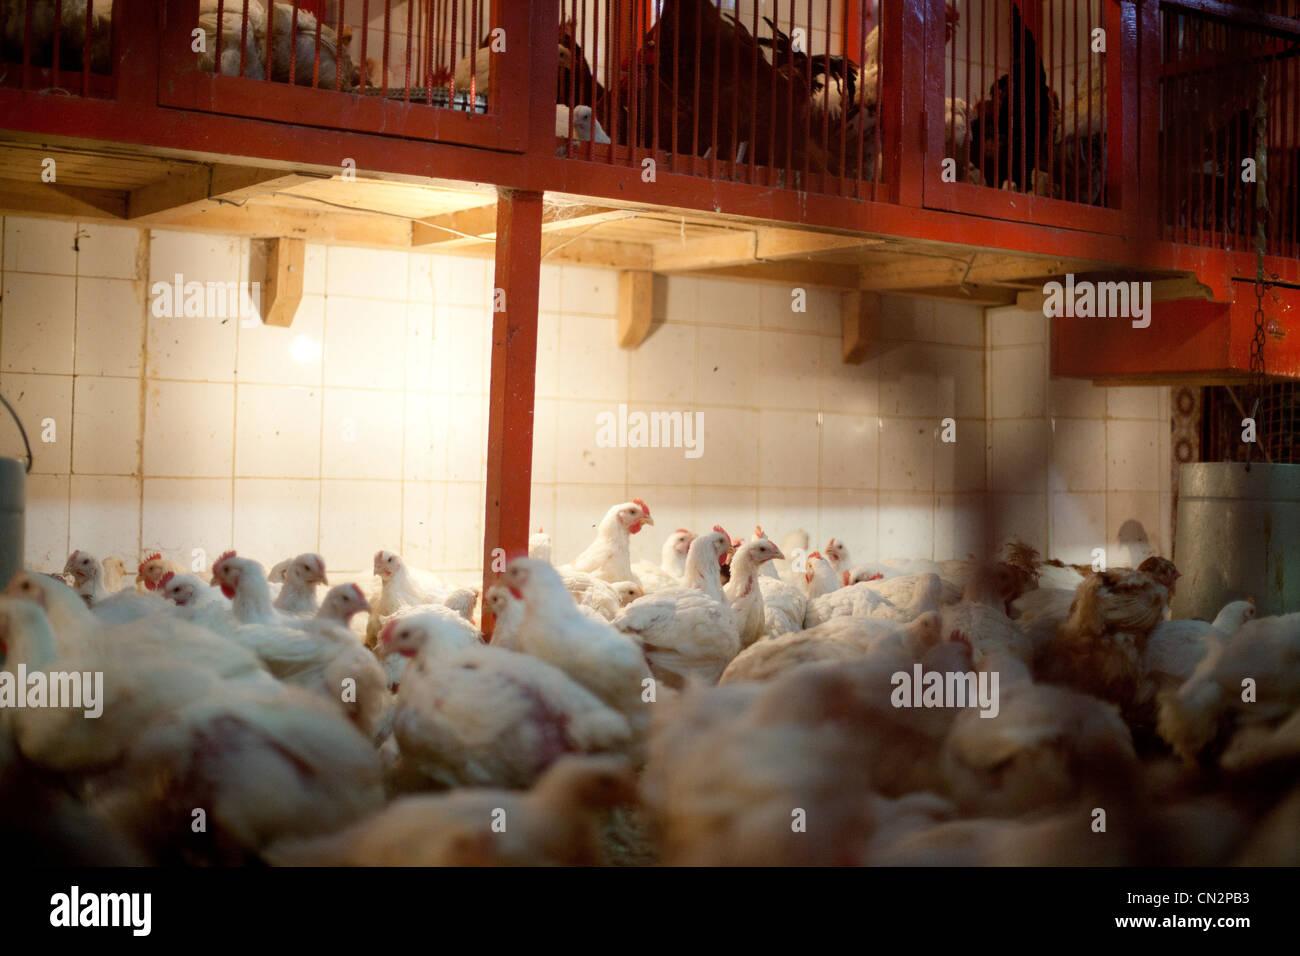 Battery hens - Stock Image